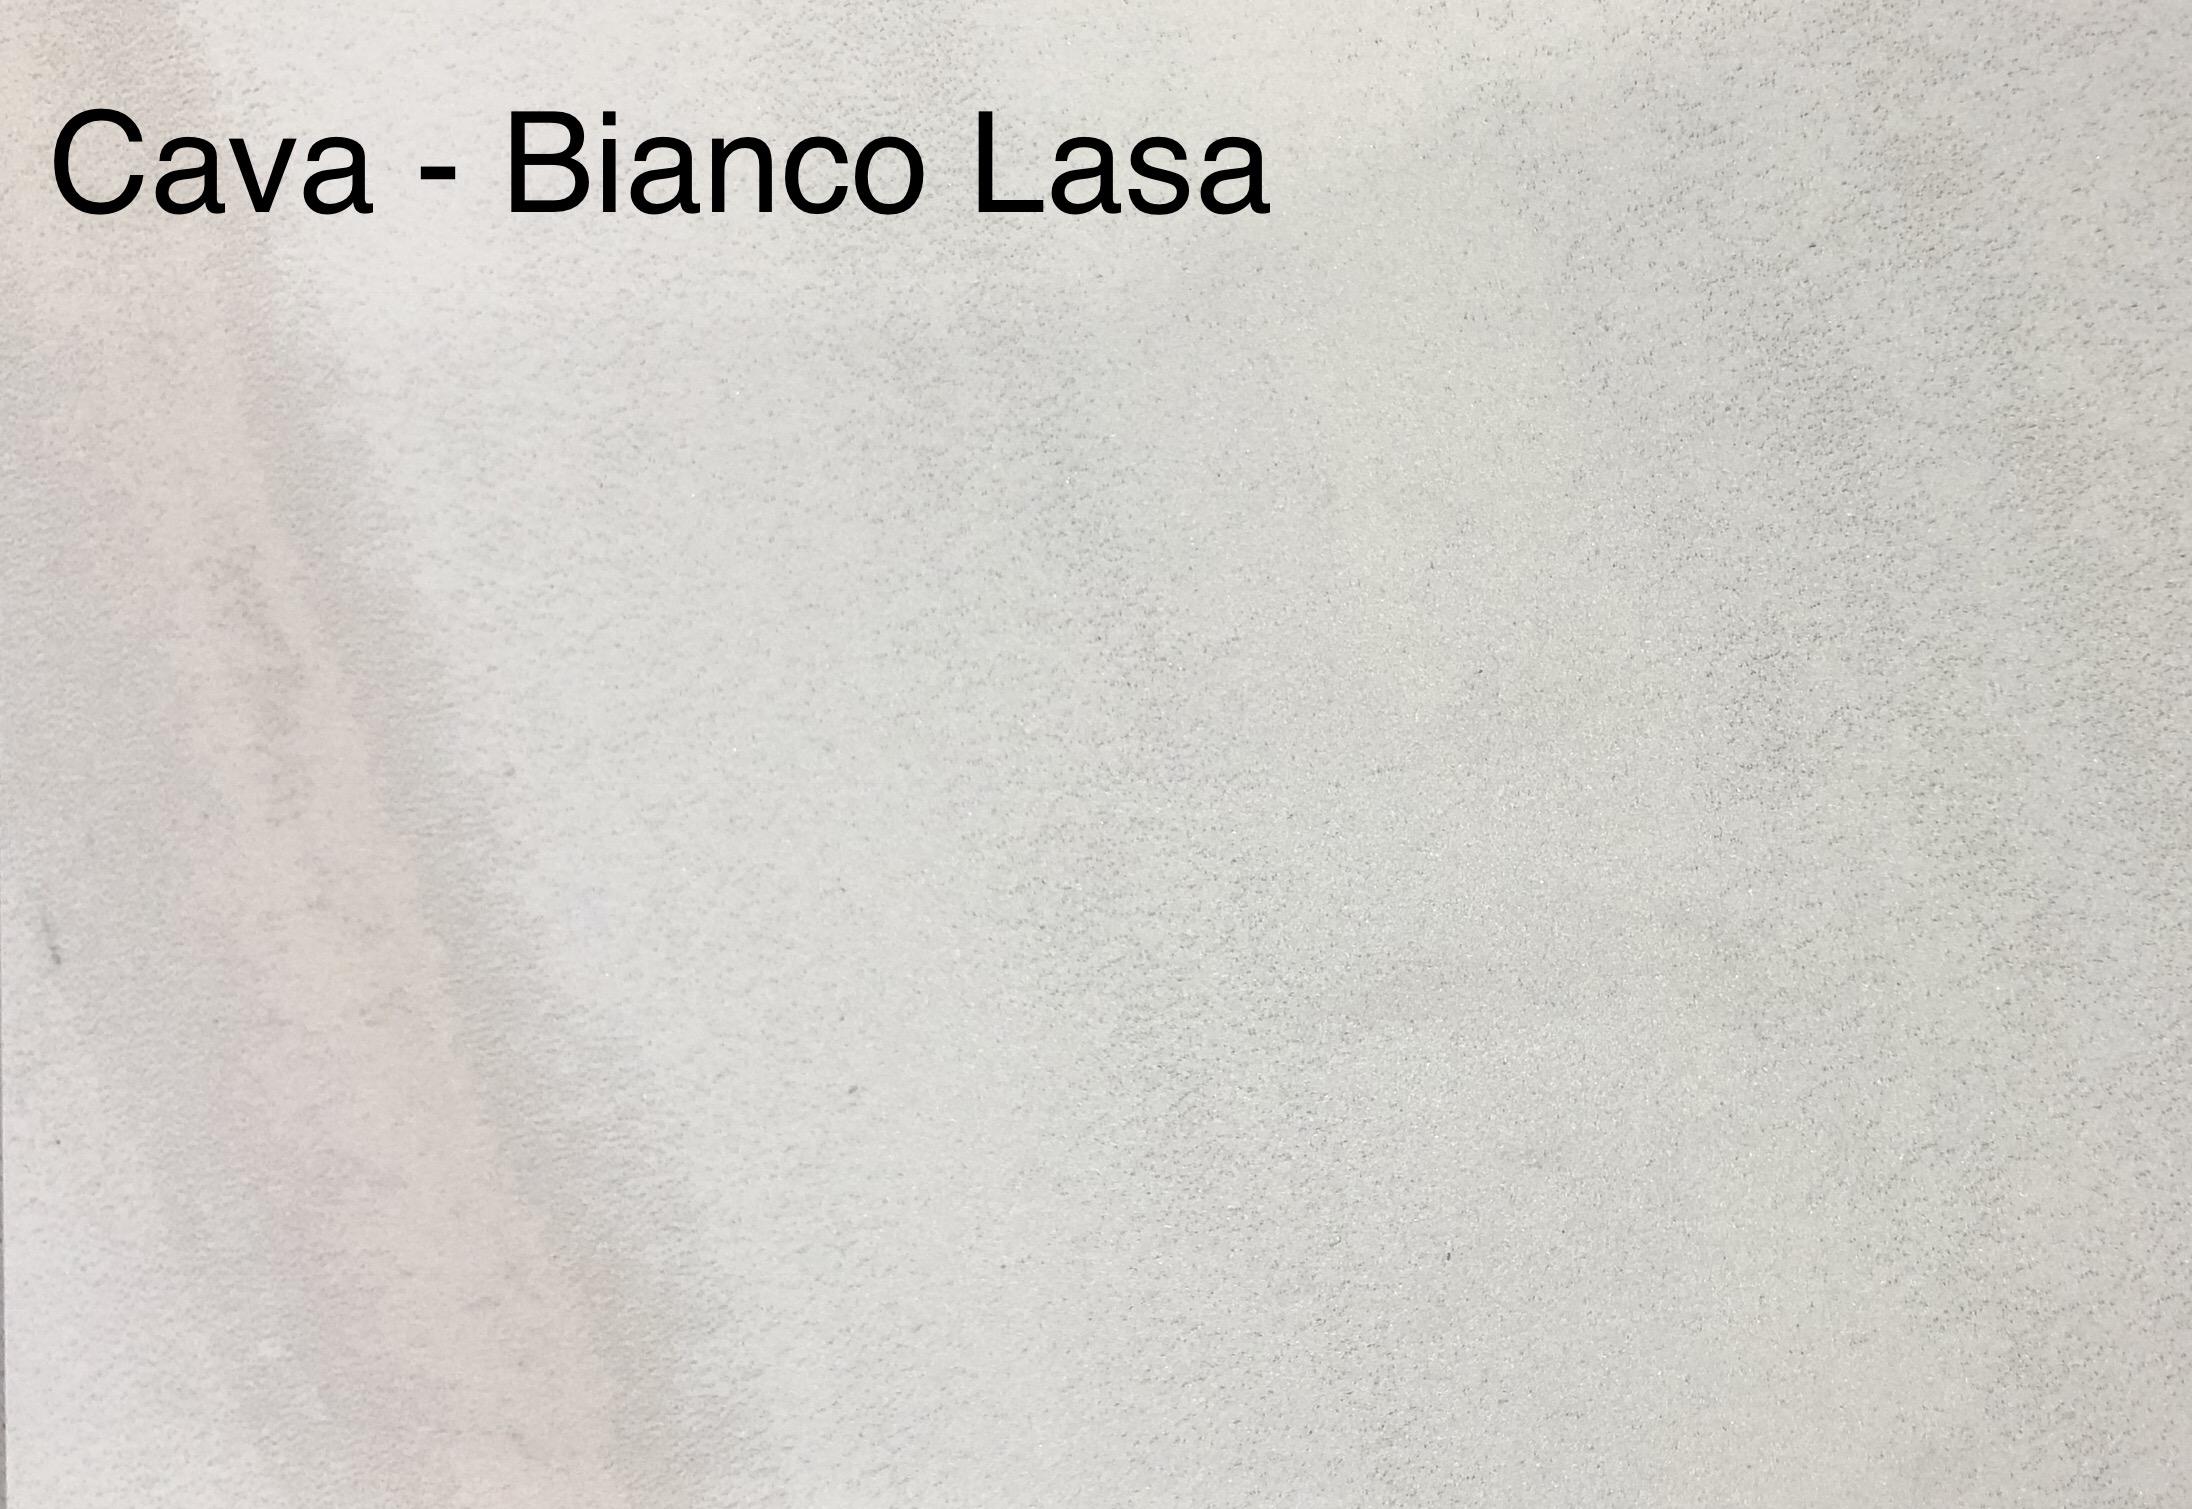 CAVA - BIANCO LASA